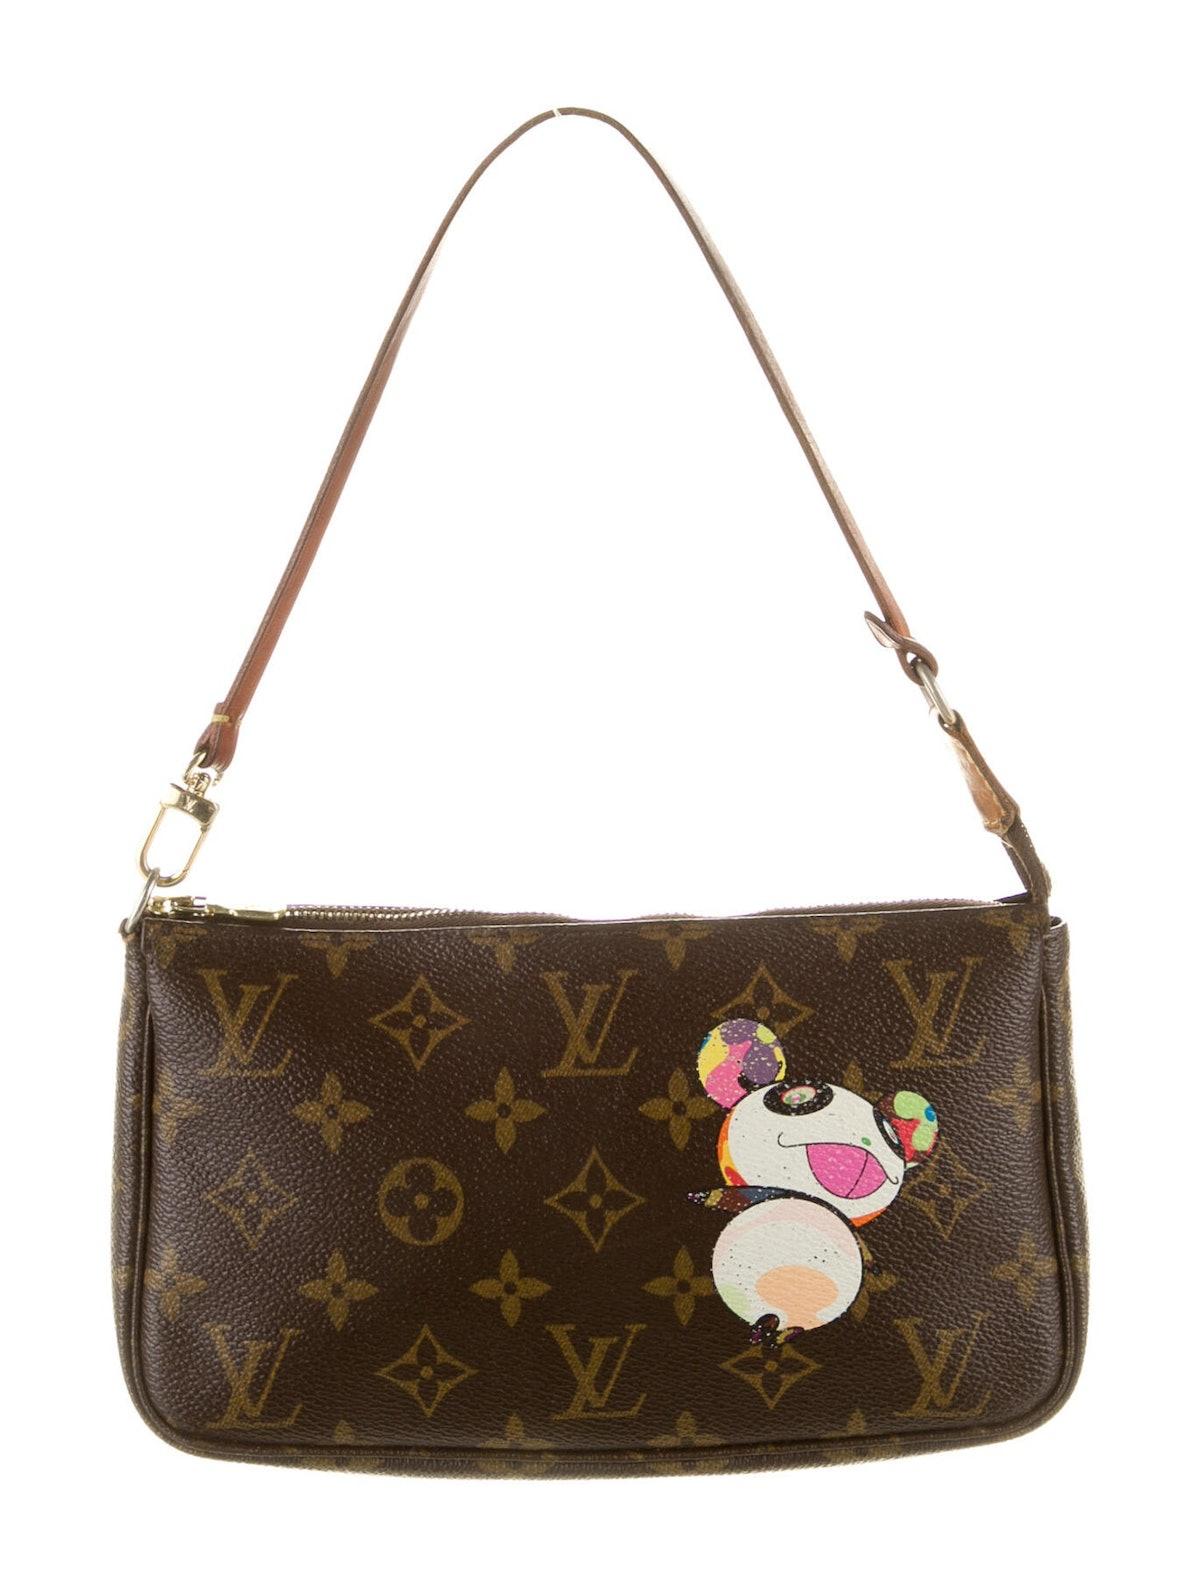 Monogram Panda Pochette Bag